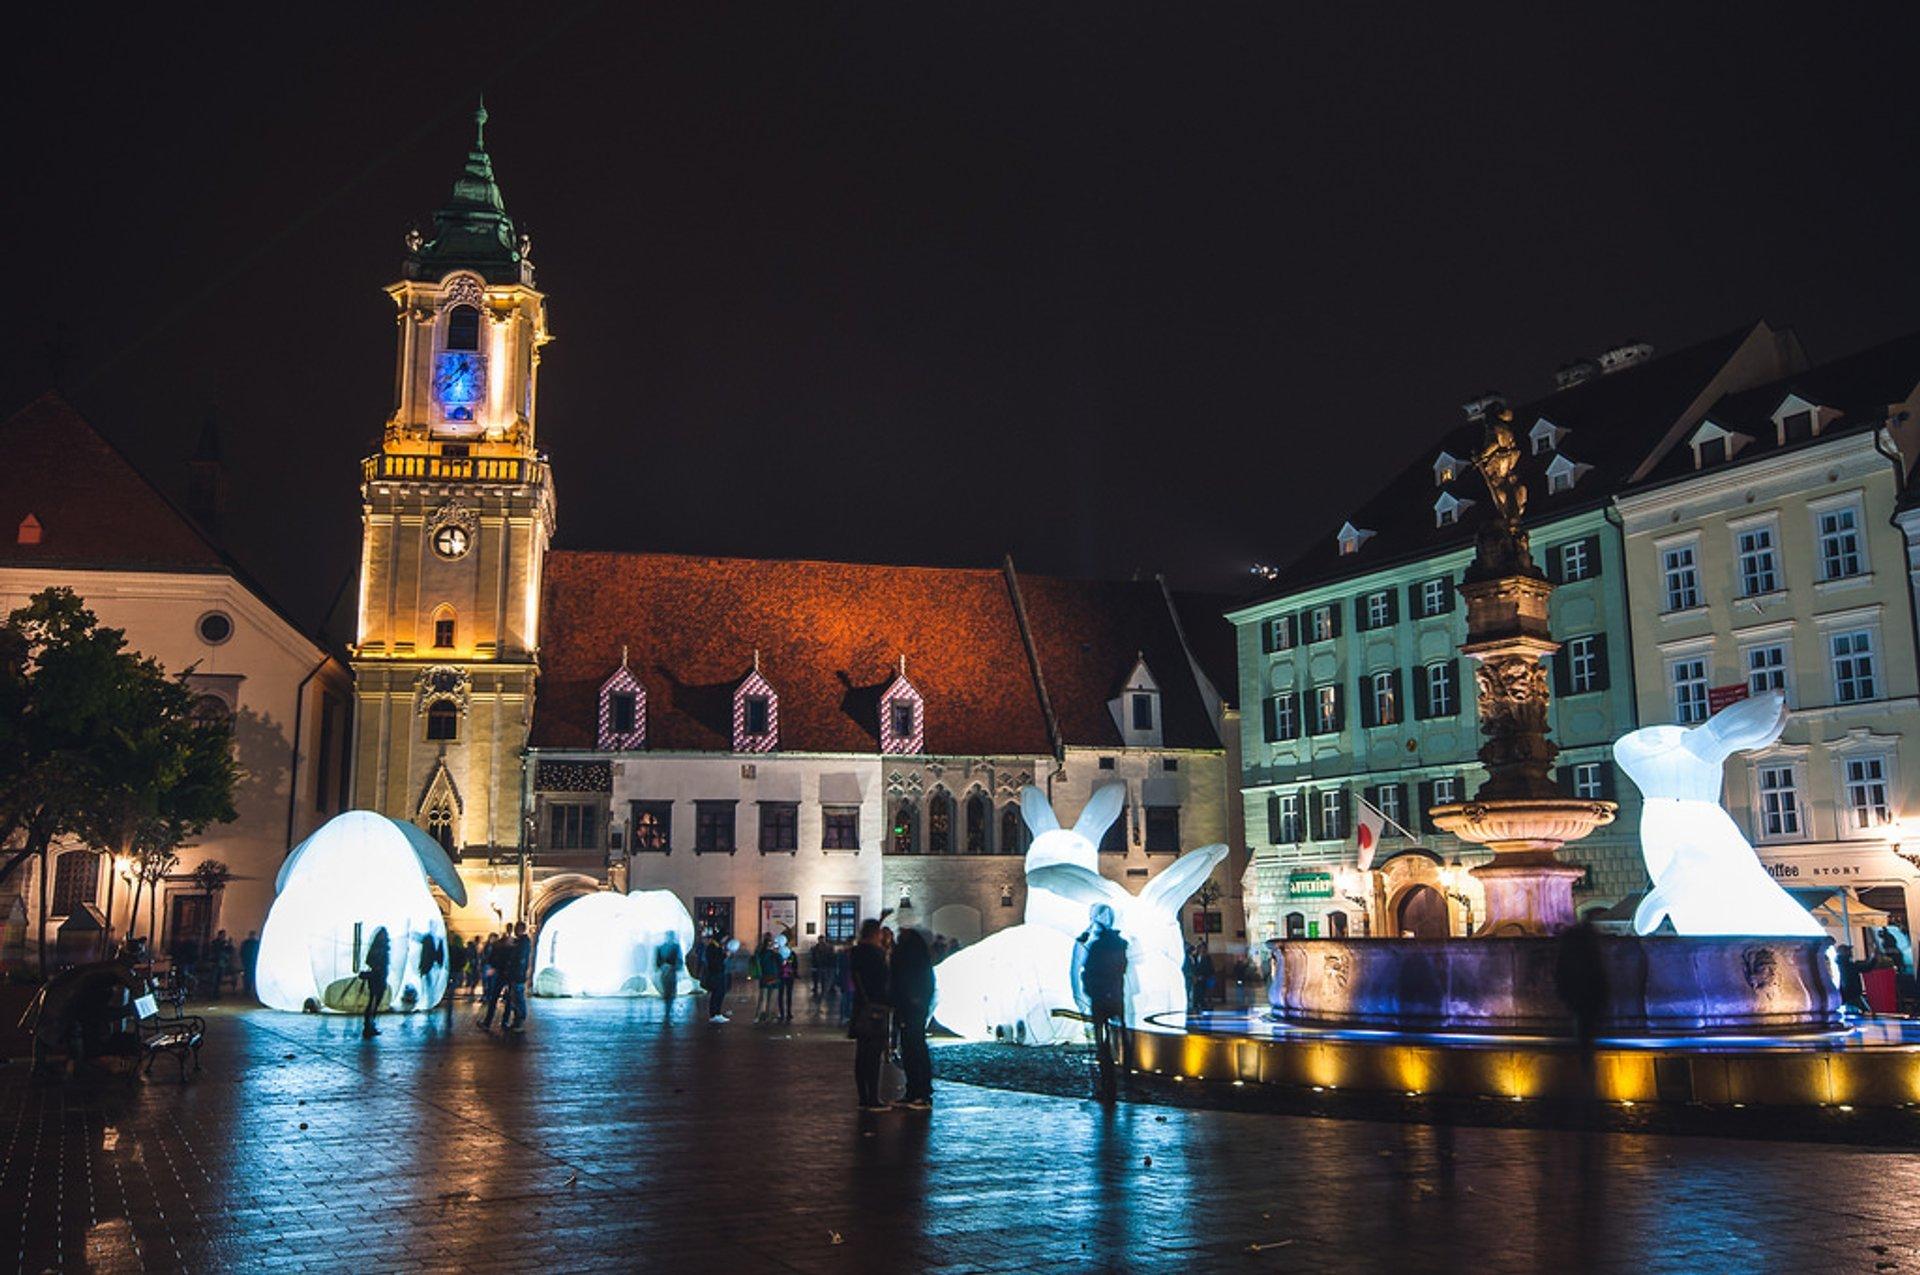 White Night Festival (Biela Noc) in Slovakia 2019 - Best Time